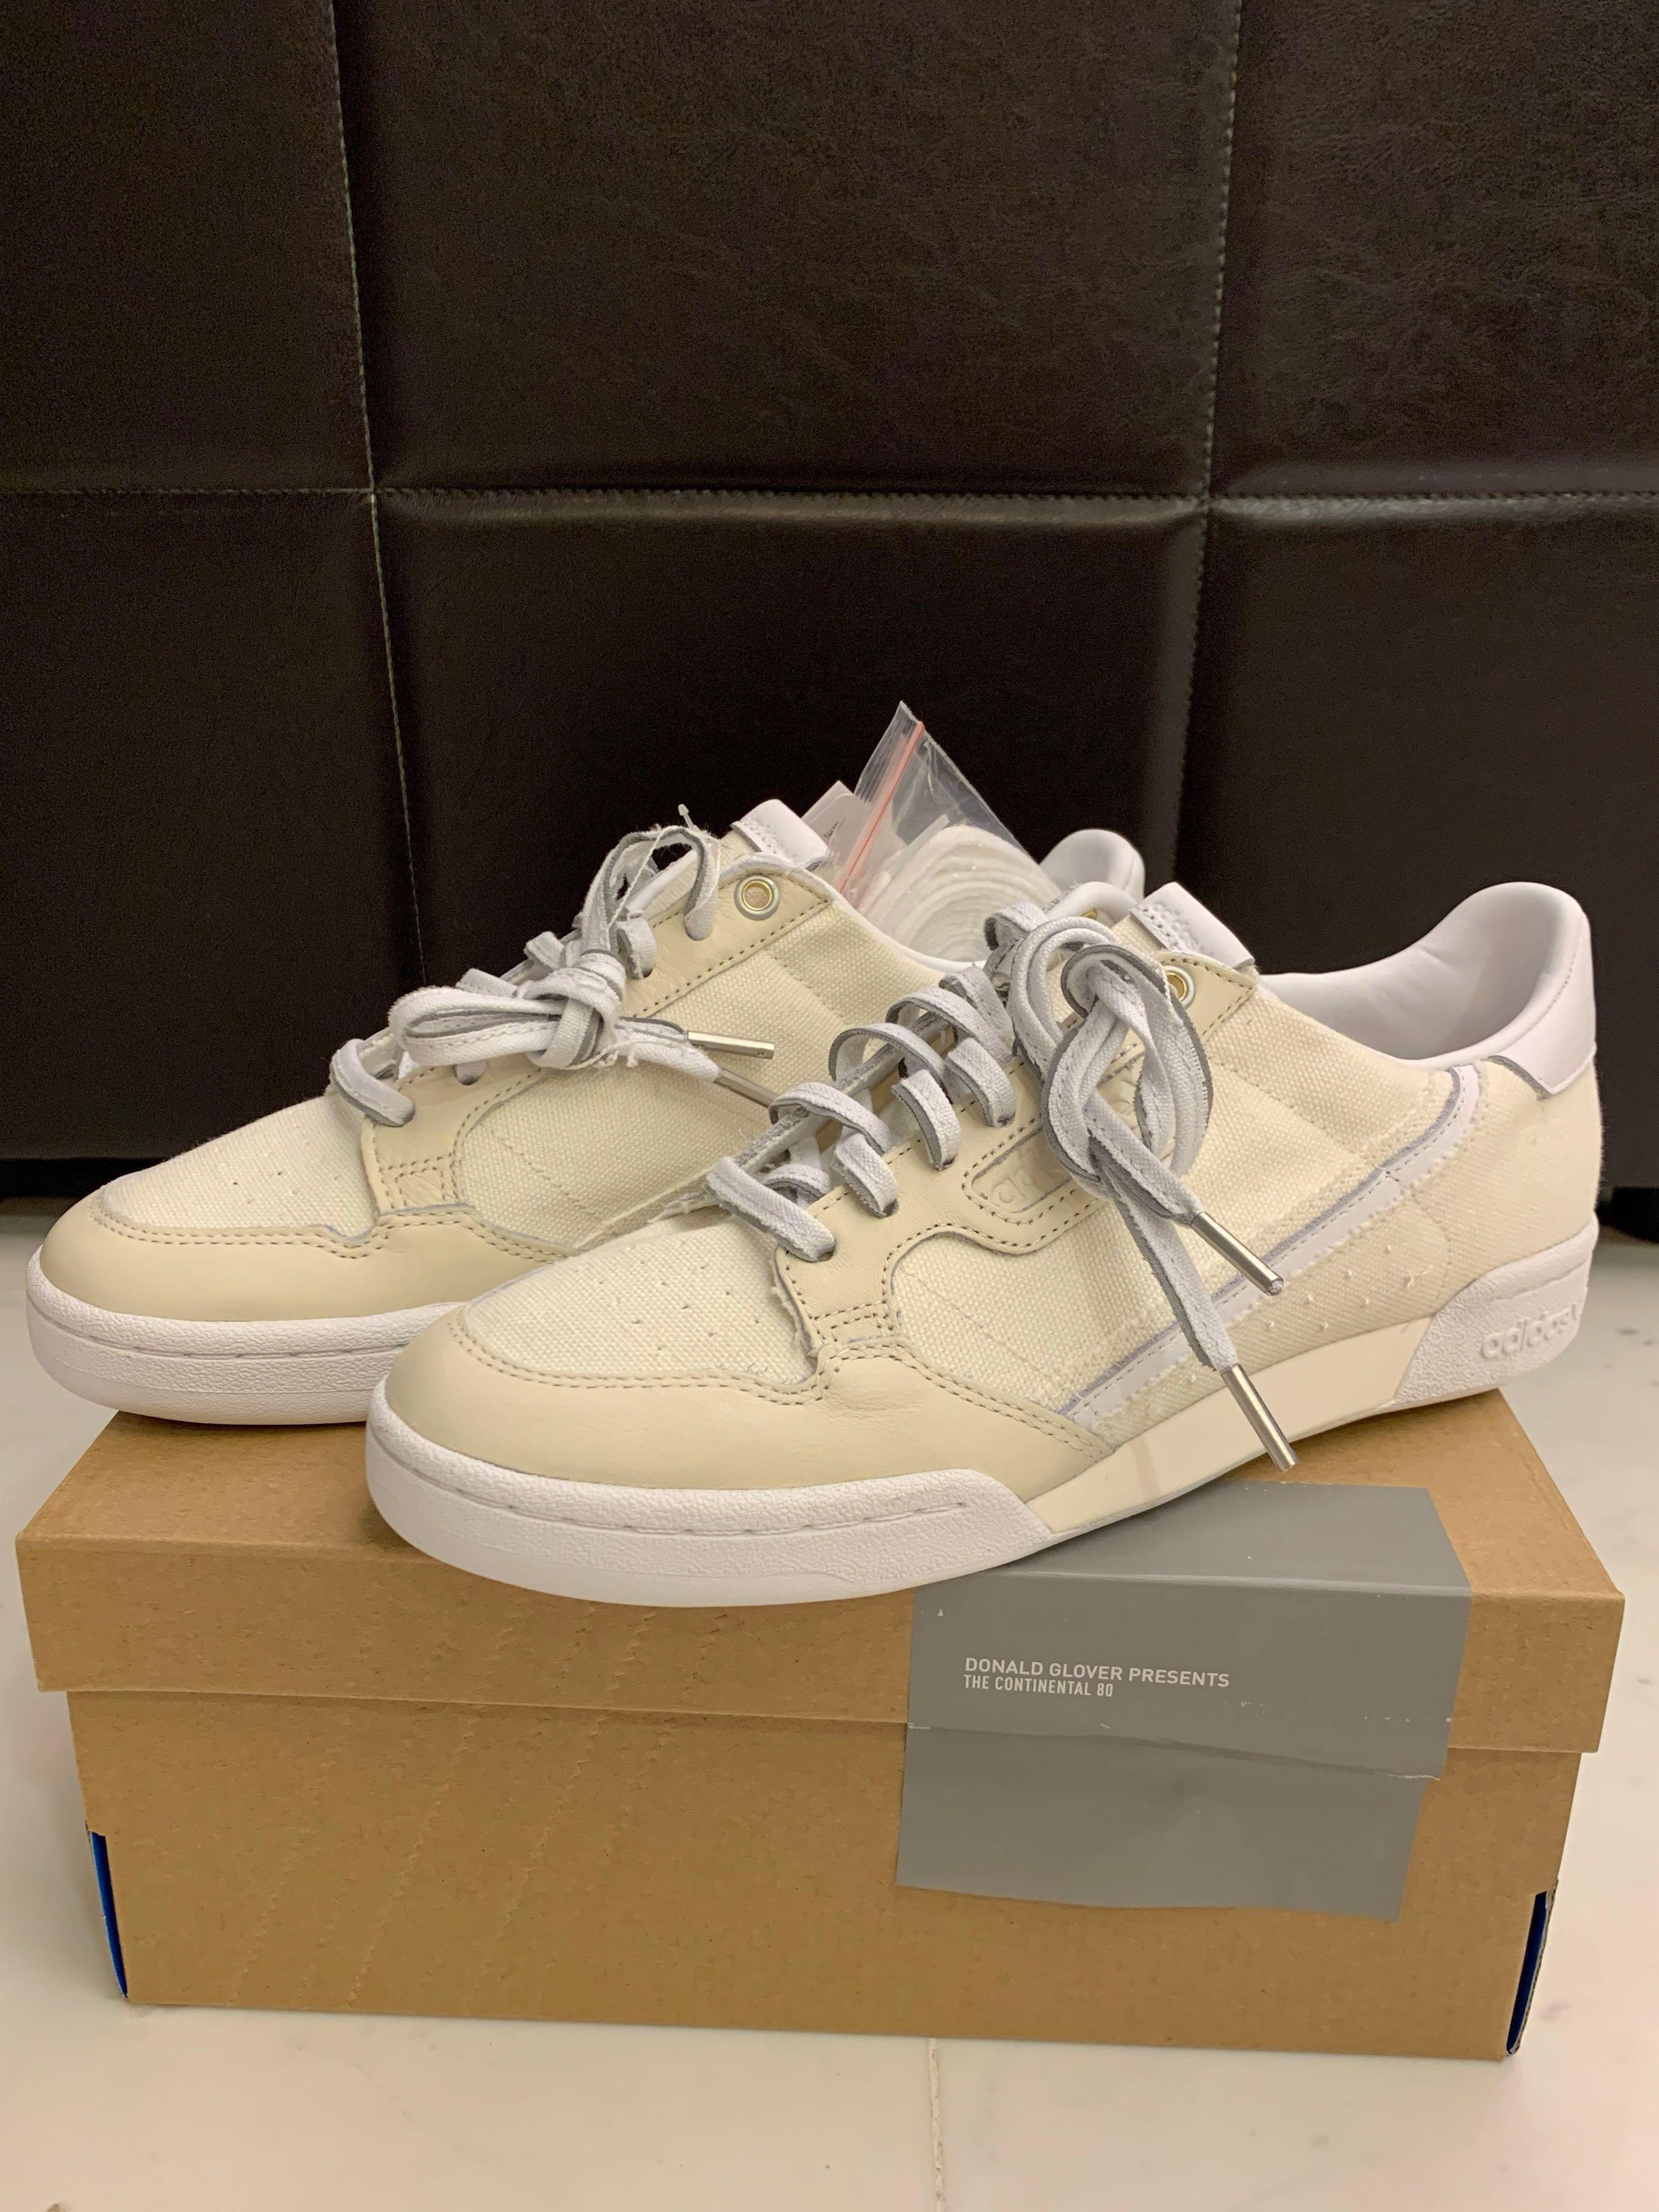 Adidas X Donald Glover Continental 80